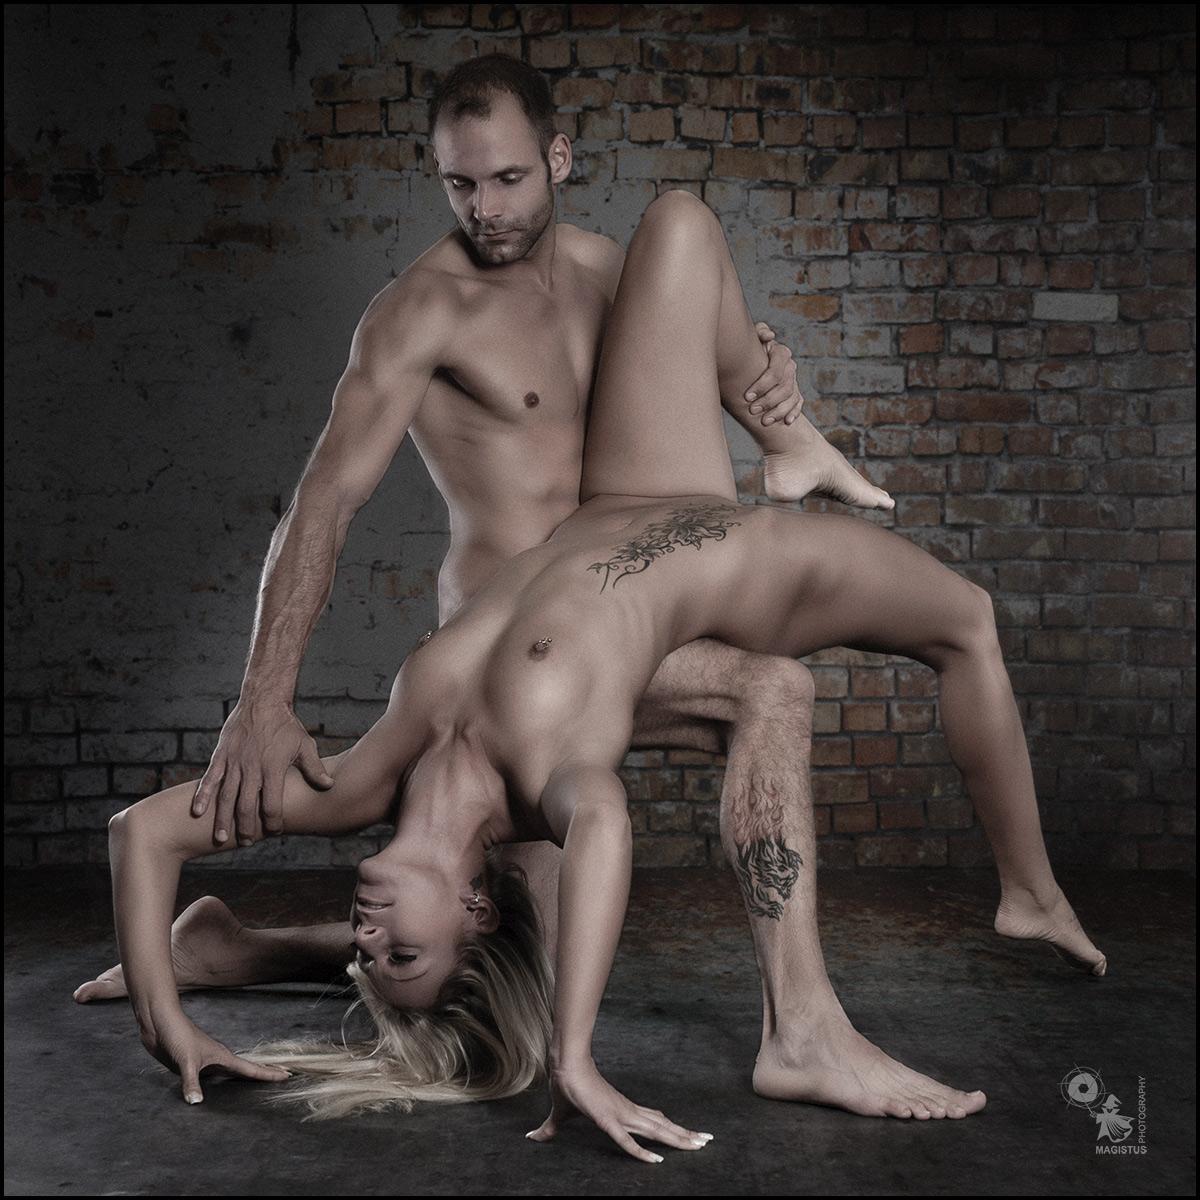 classic nude art jpg 422x640